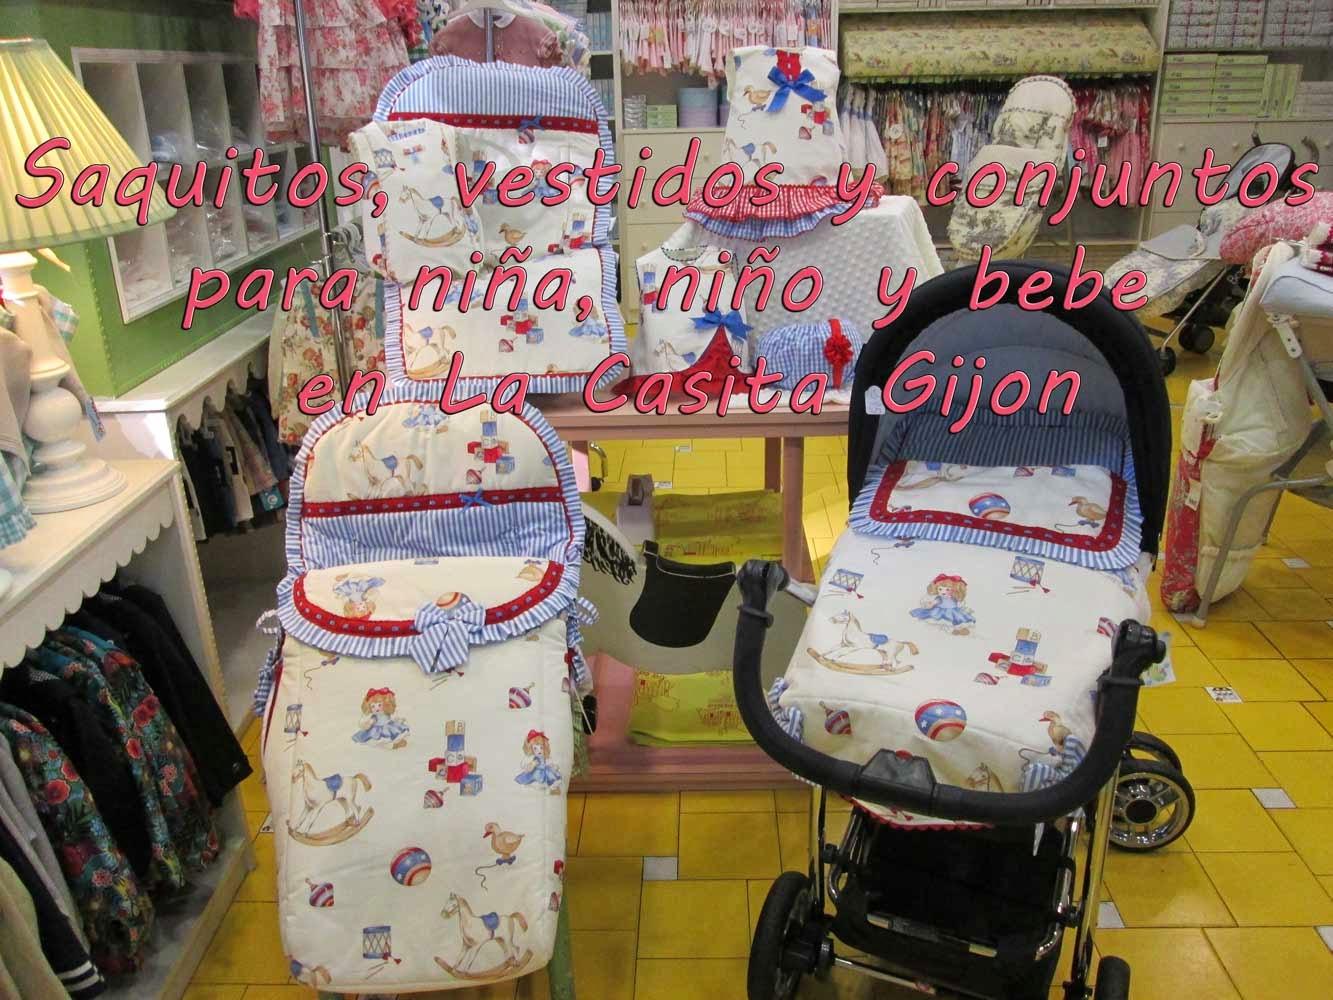 http://lacasitagijon.com/VestidoGloria